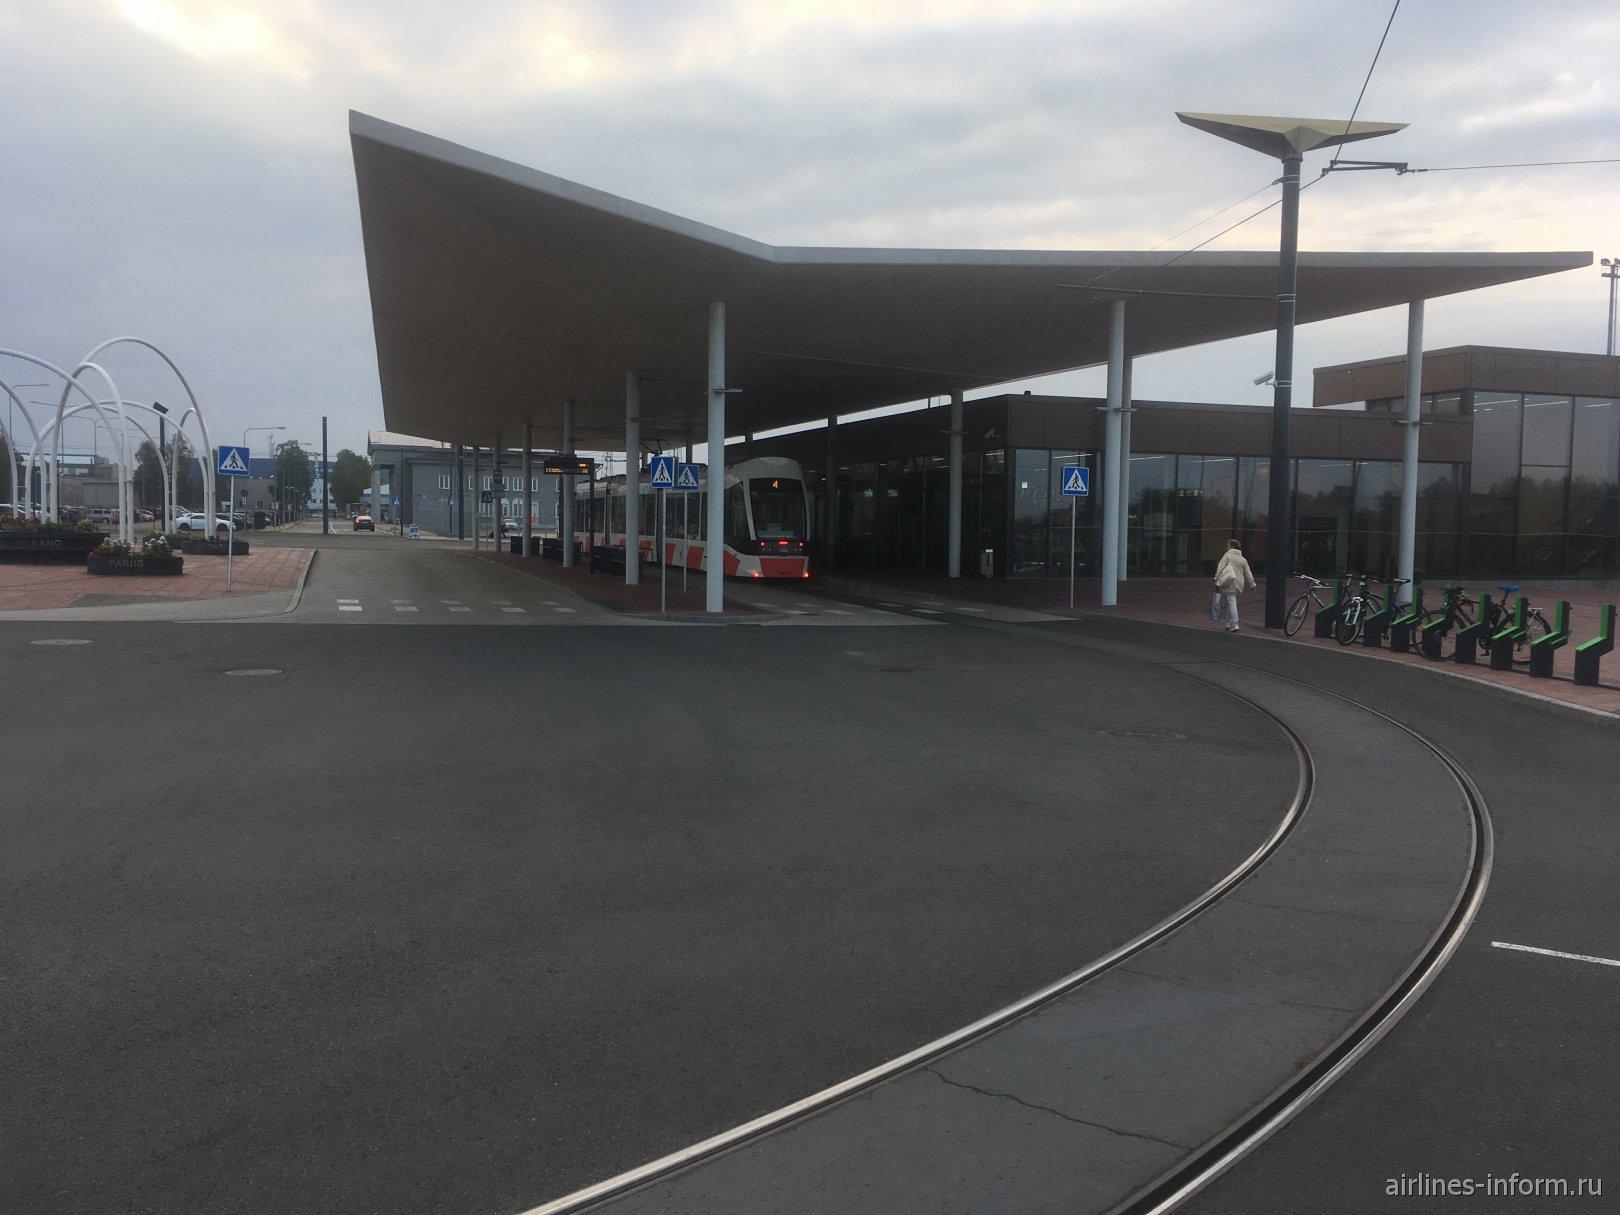 Трамвайная остановка в аэропорту Таллин